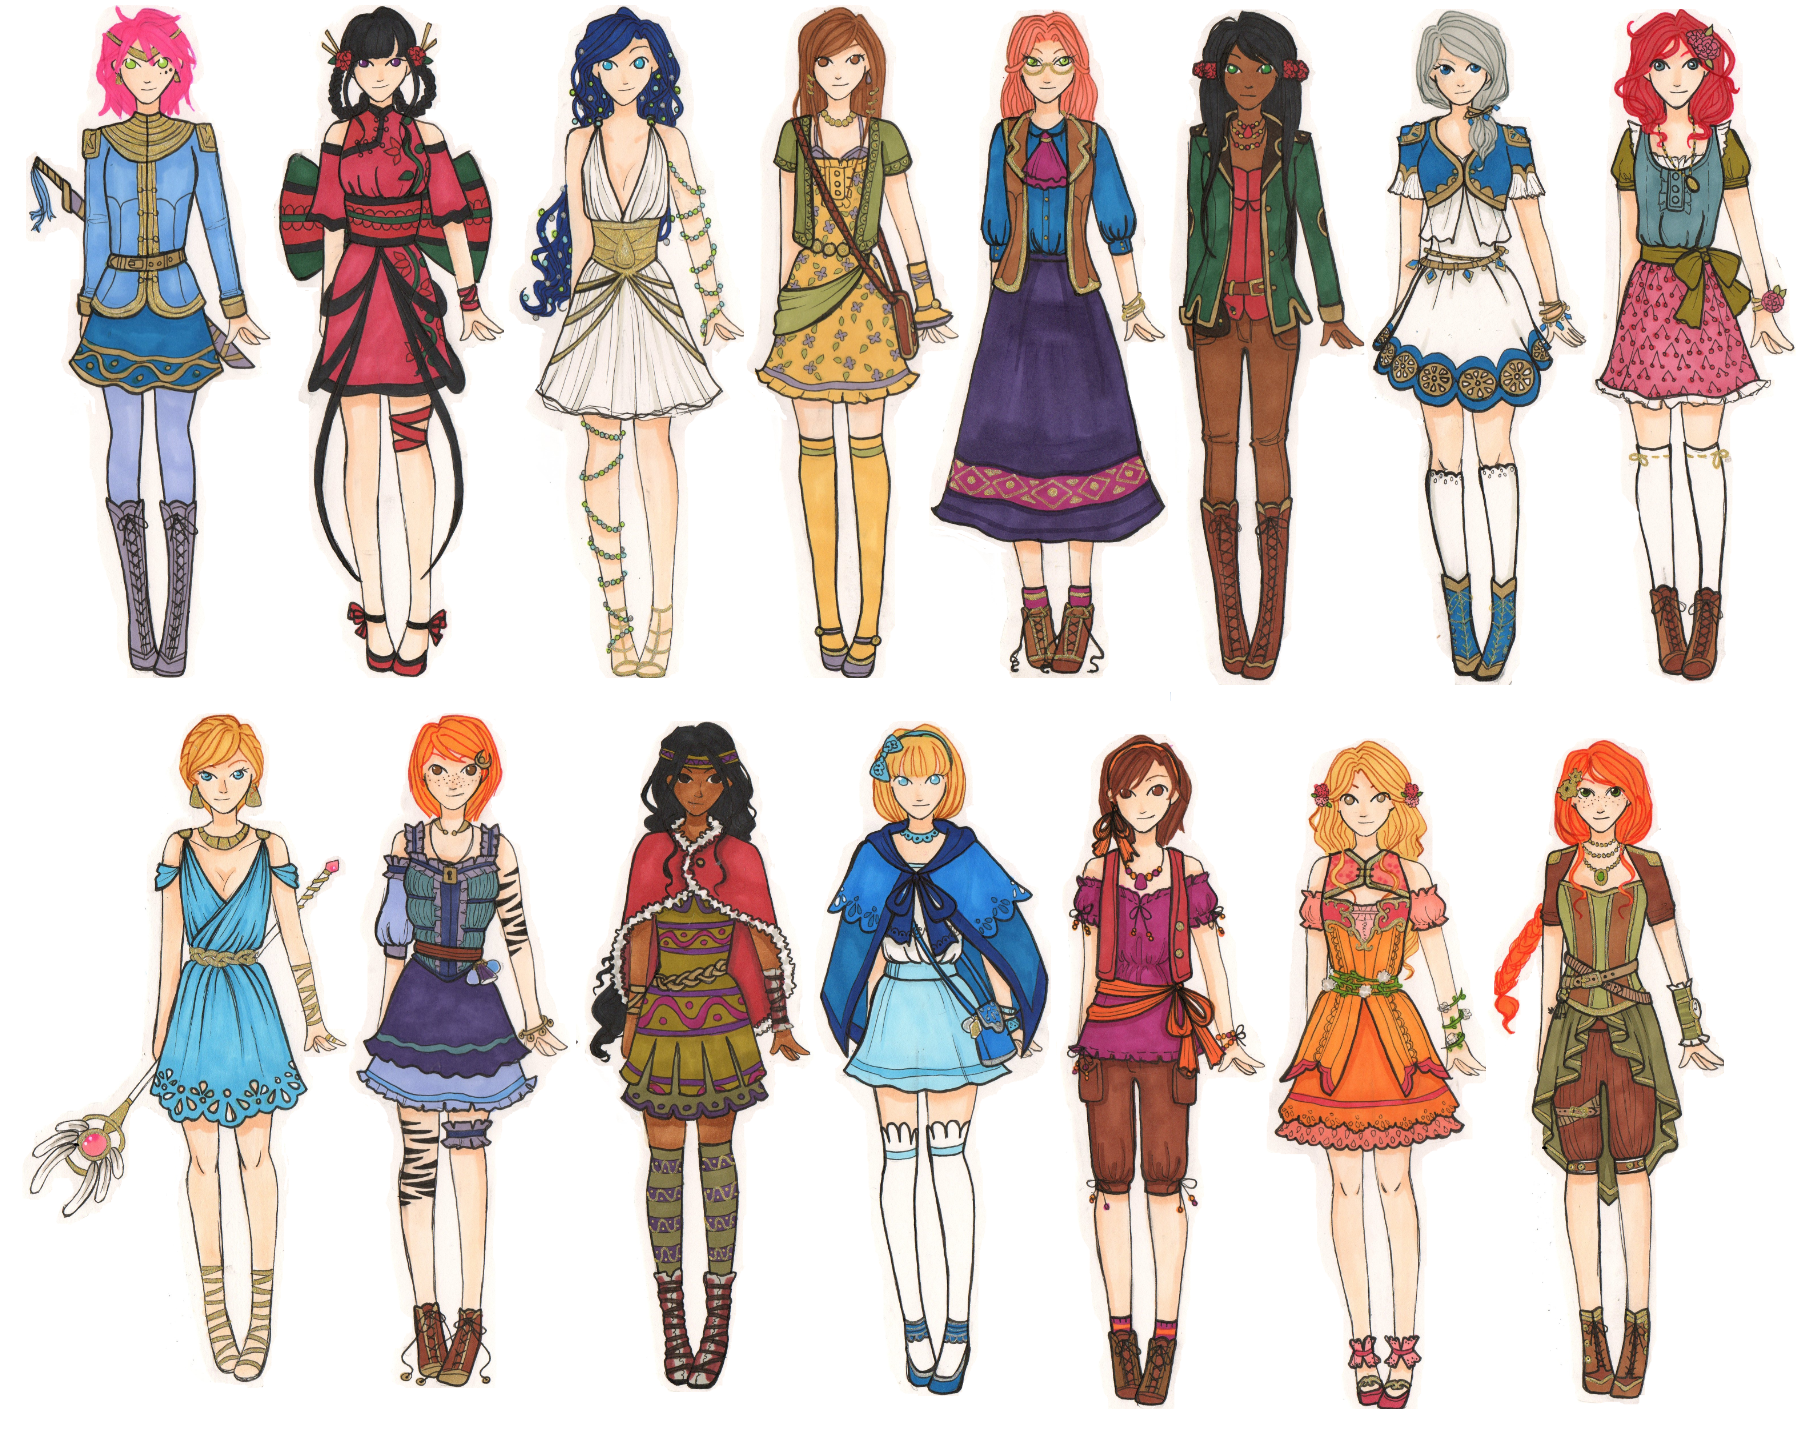 dress patterns for teenage girls 2013